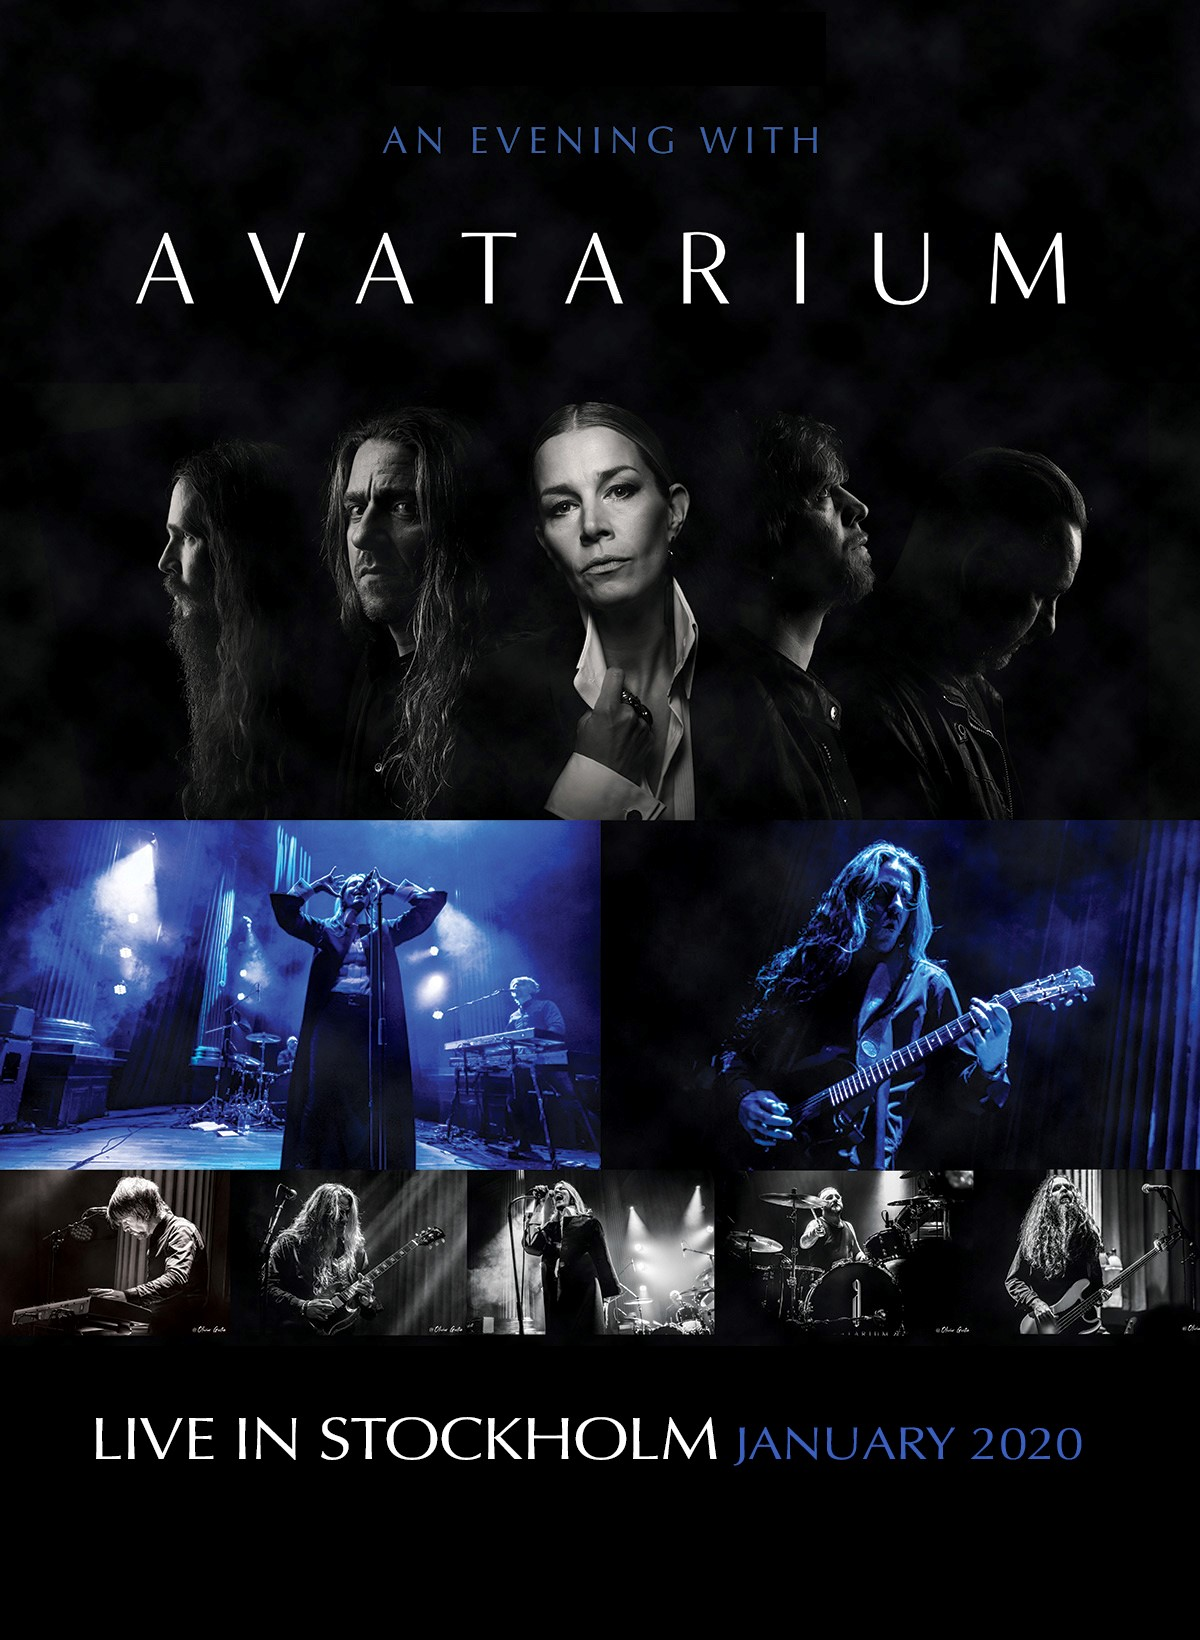 avatarium an evening with